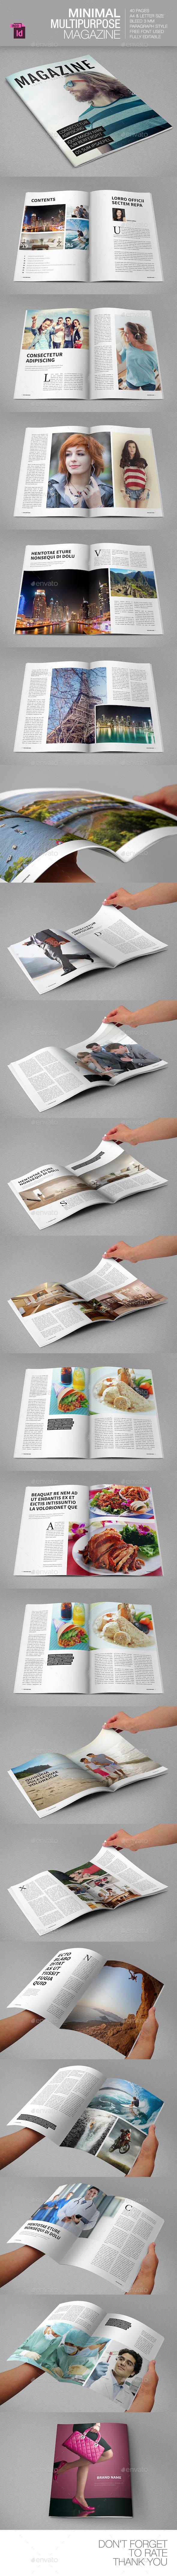 Minimal Multipurpose Magazine - Magazines Print Templates